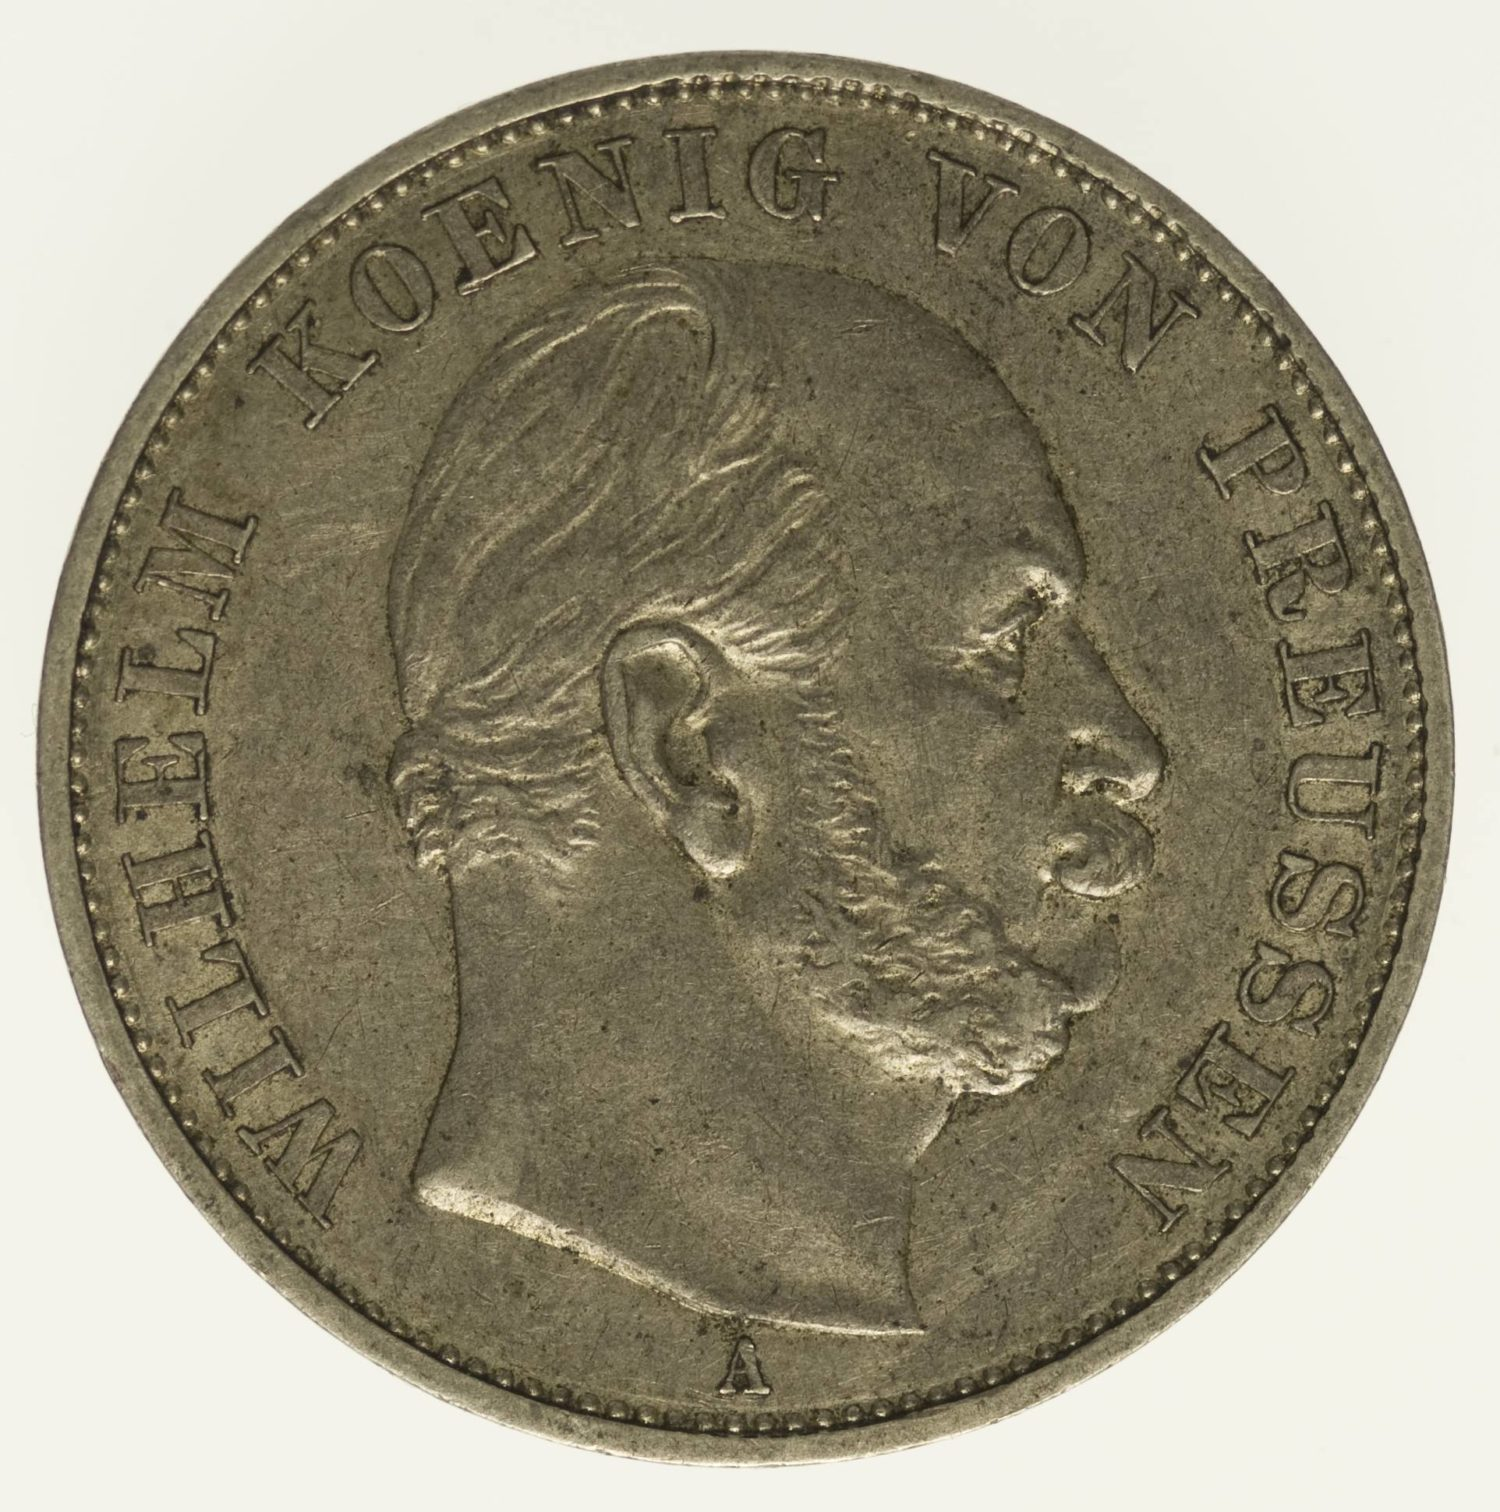 Preussen Wilhelm I. Vereinstaler 1871 Silber 16,67 Gramm fein RAR